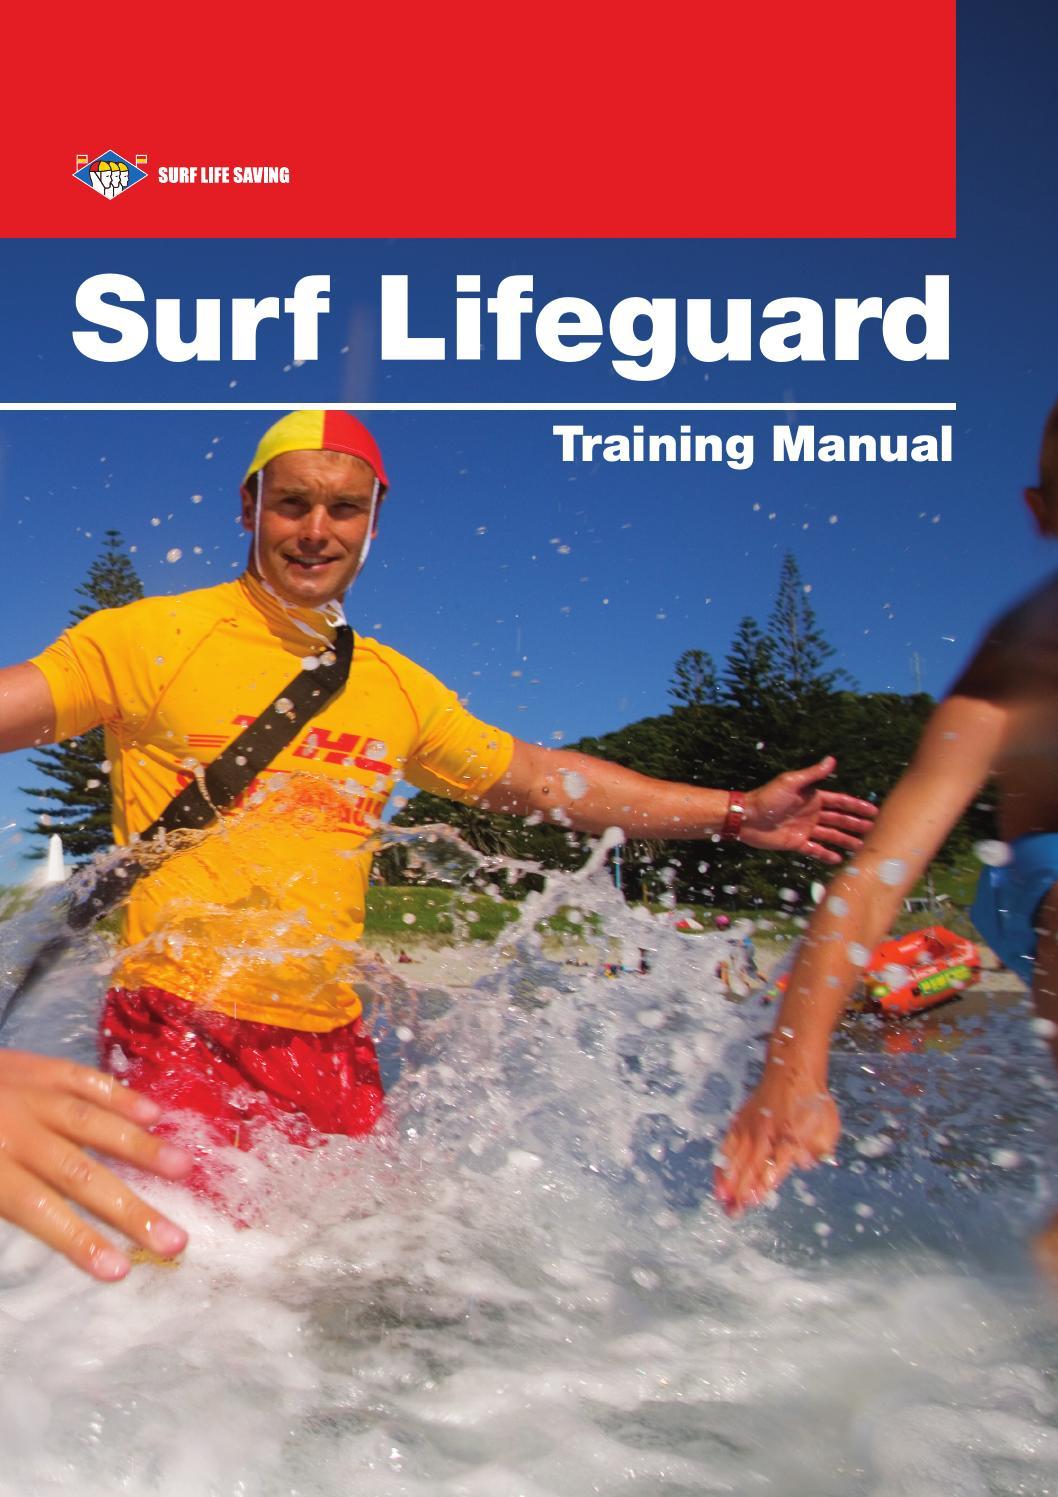 SLGA Manual (updated September 2015) by Surf Life Saving New Zealand - issuu